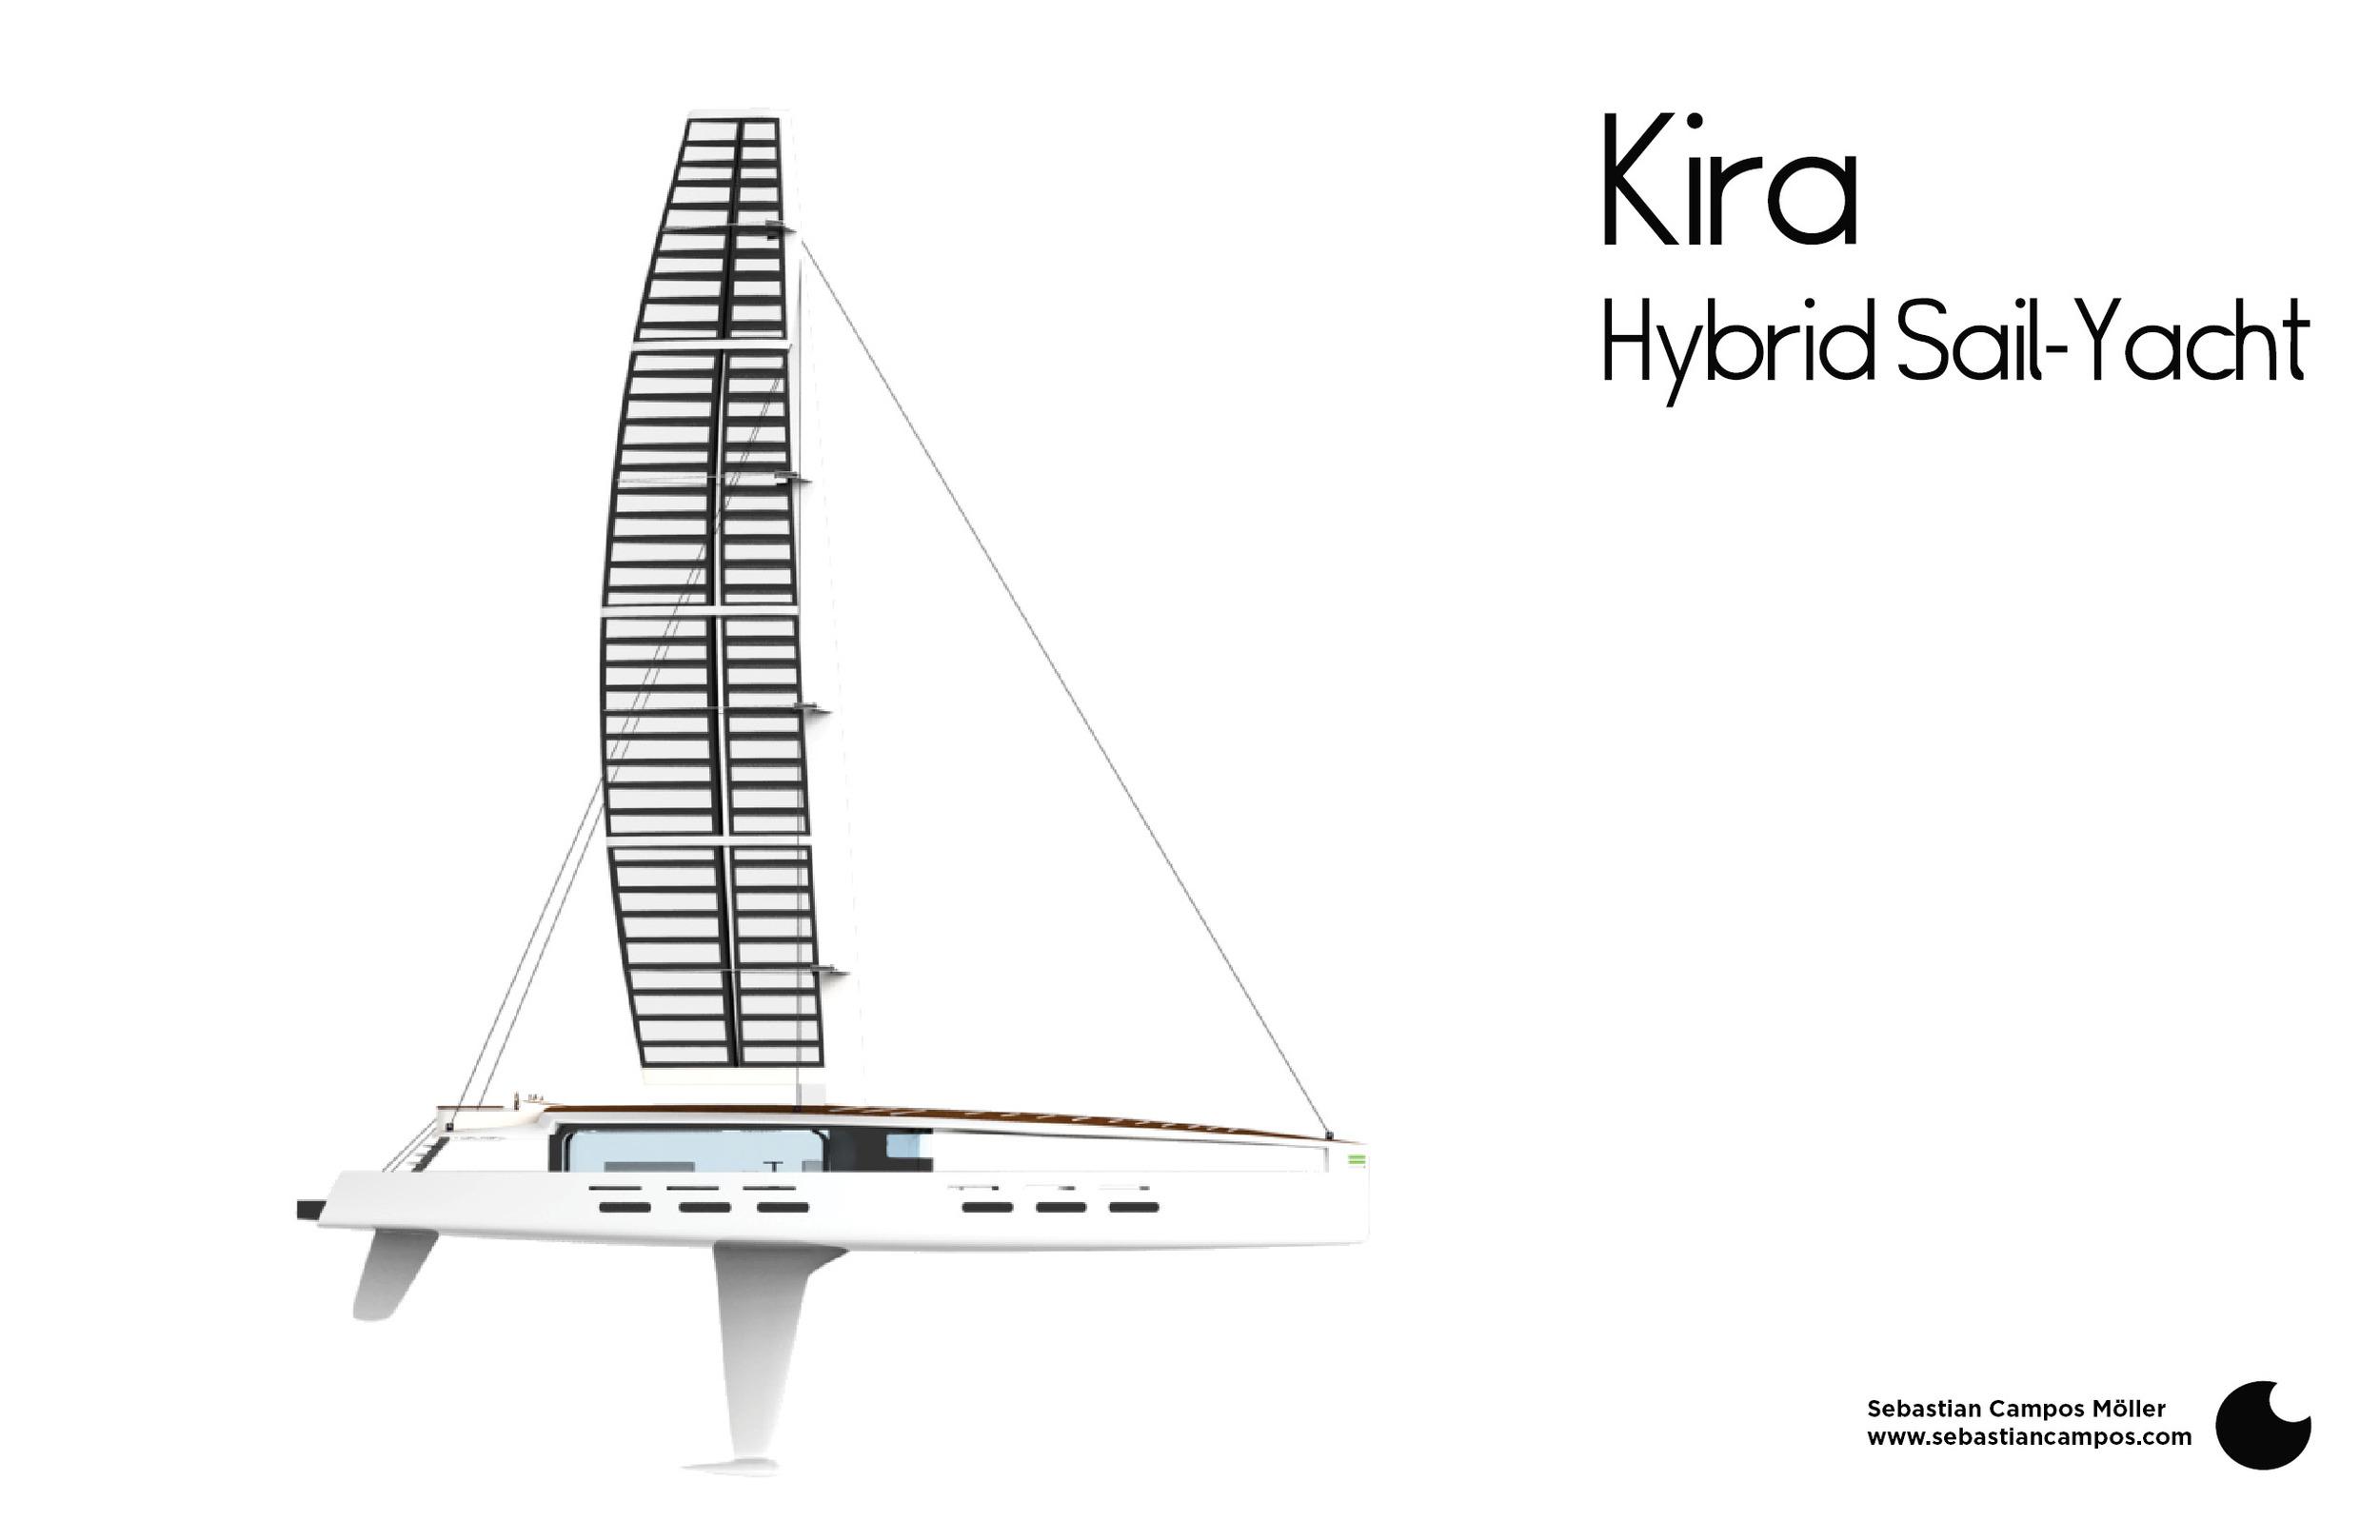 Kira Profile view by Sebastian Campos Moller